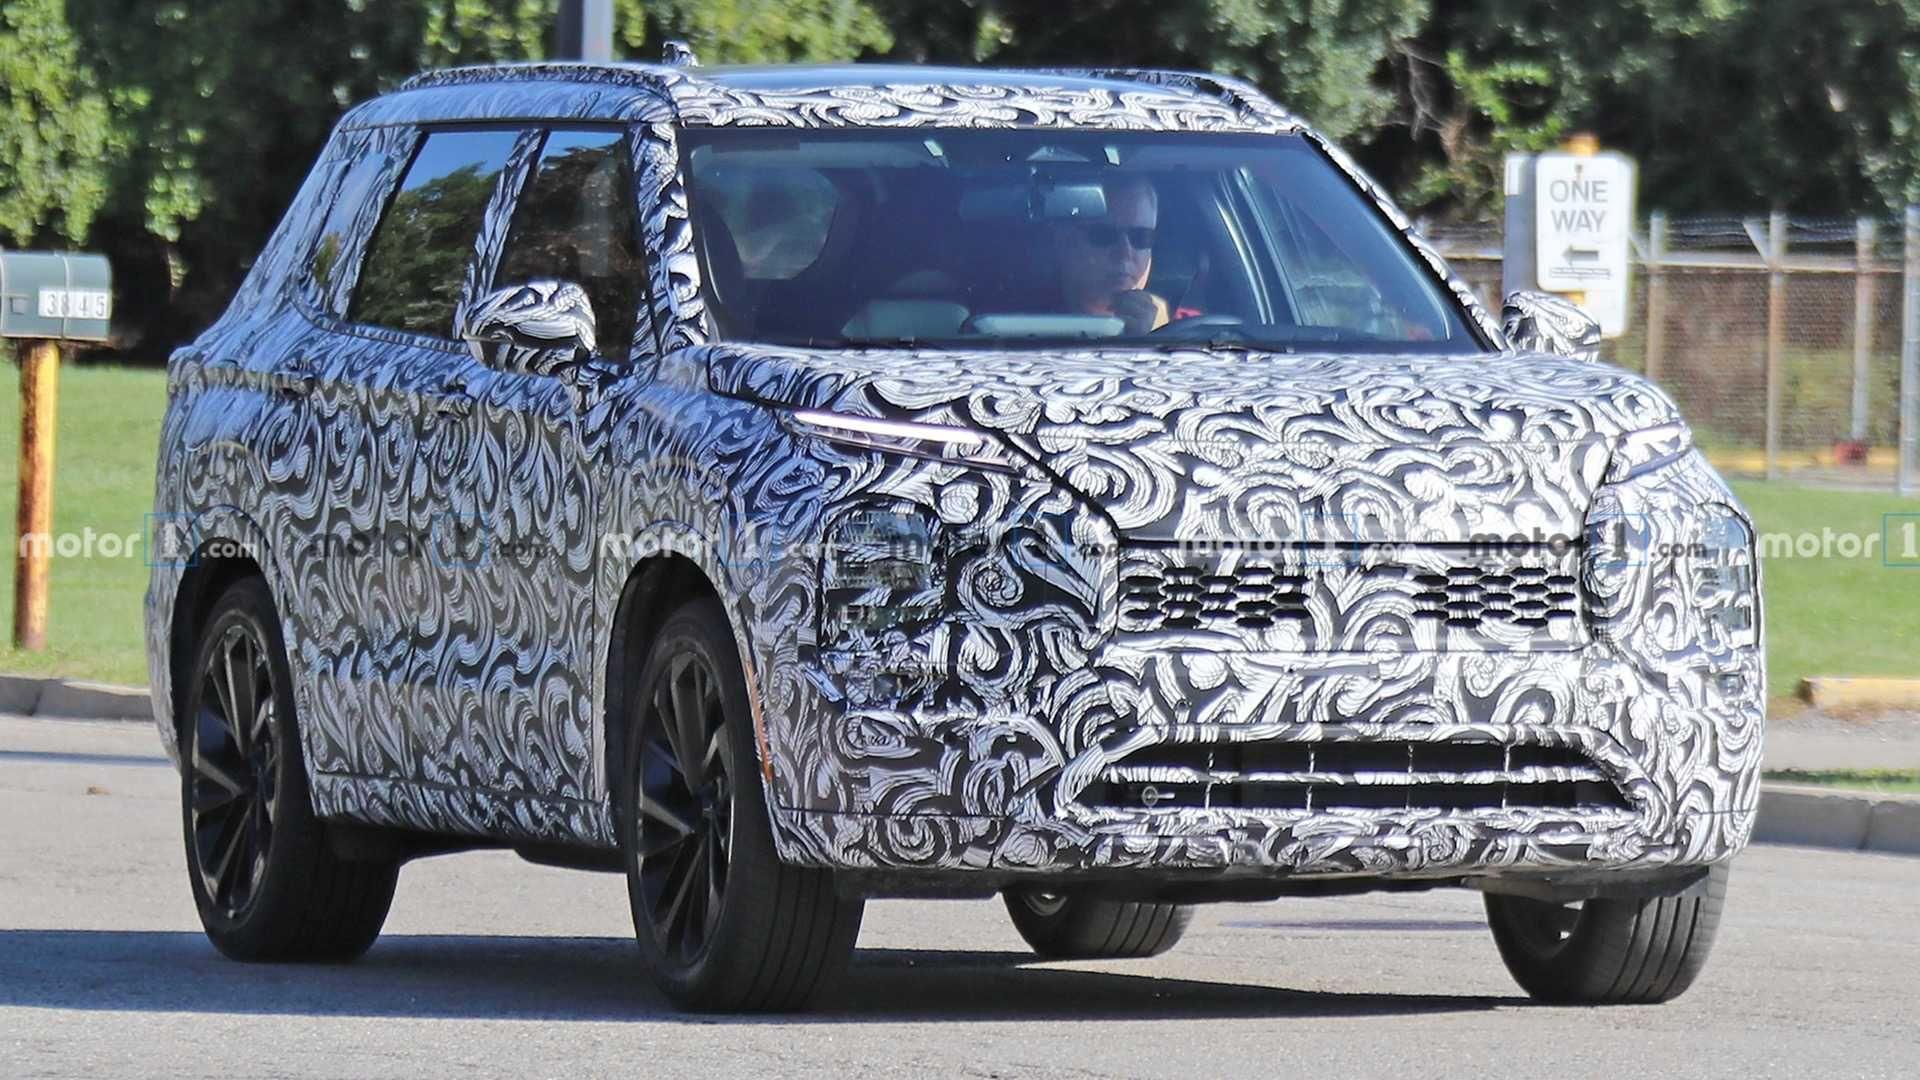 2021 Mitsubishi Outlander Phev Likely Has More Power Ev Range In 2020 Mitsubishi Outlander Outlander Phev Mitsubishi